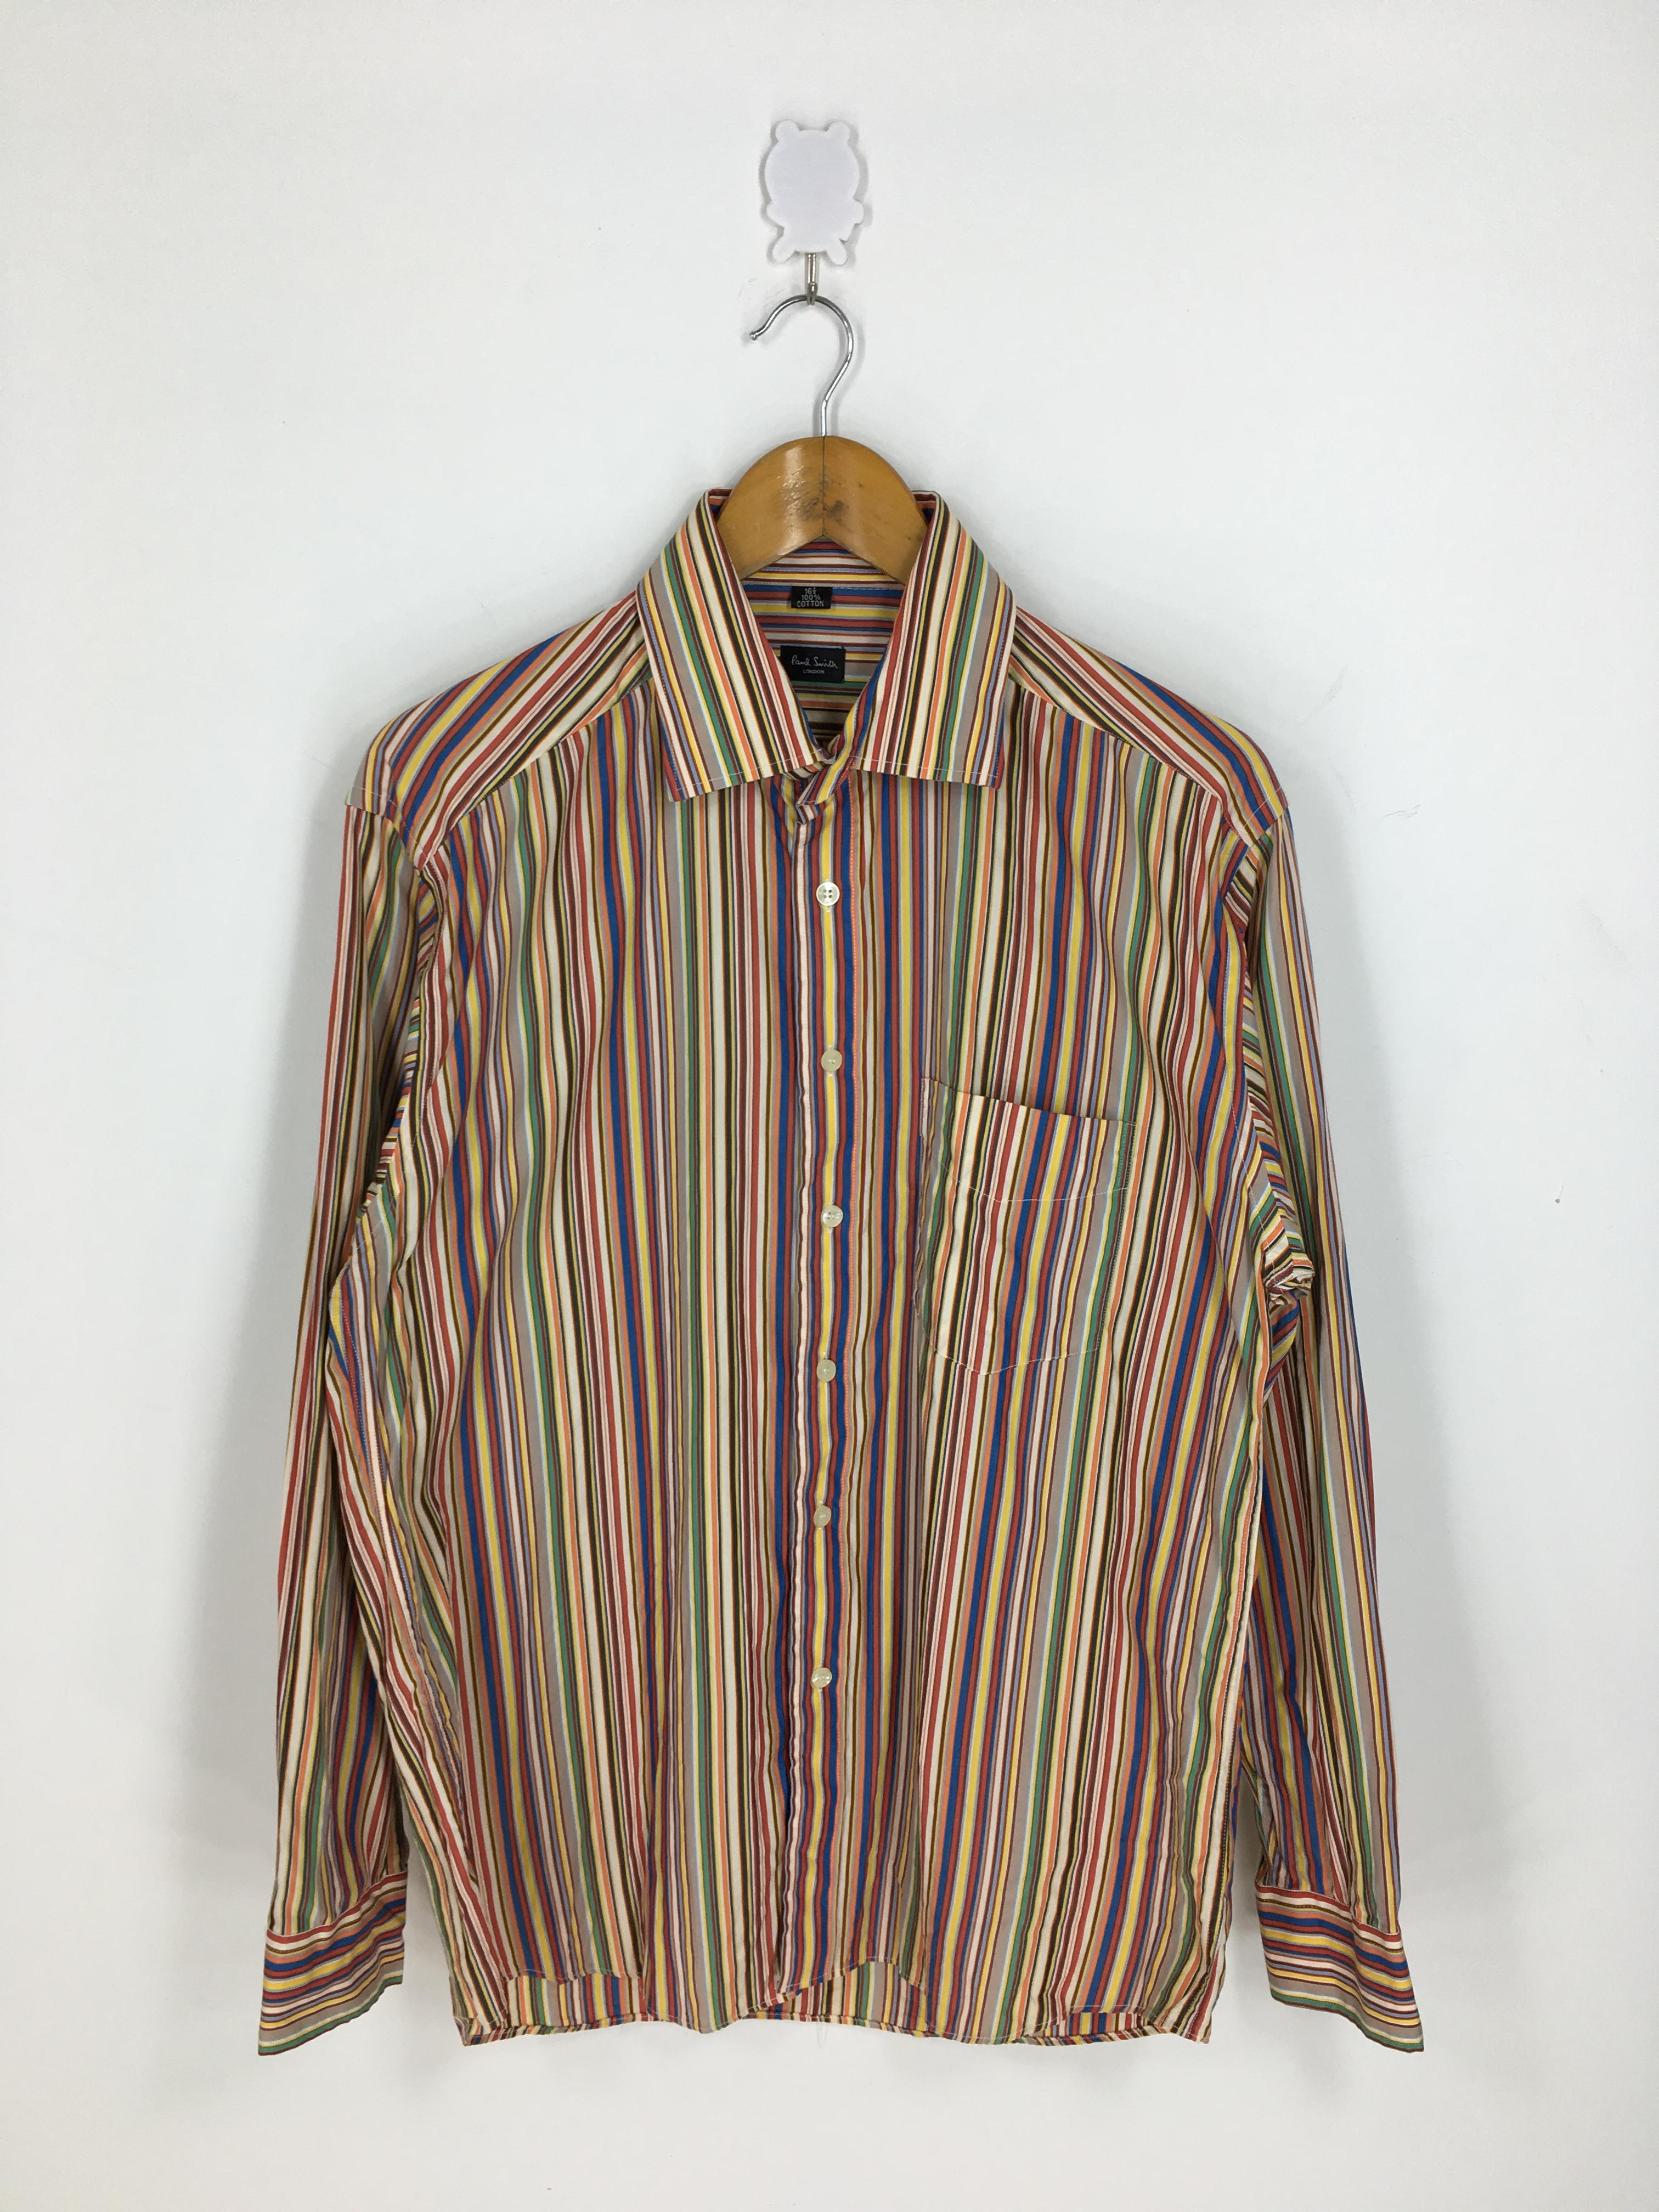 Vintage Paul Smith London Striped Multicolor Oxfords Medium Paul Smith Flannel Button Down Border Stripes Oxfords Size M